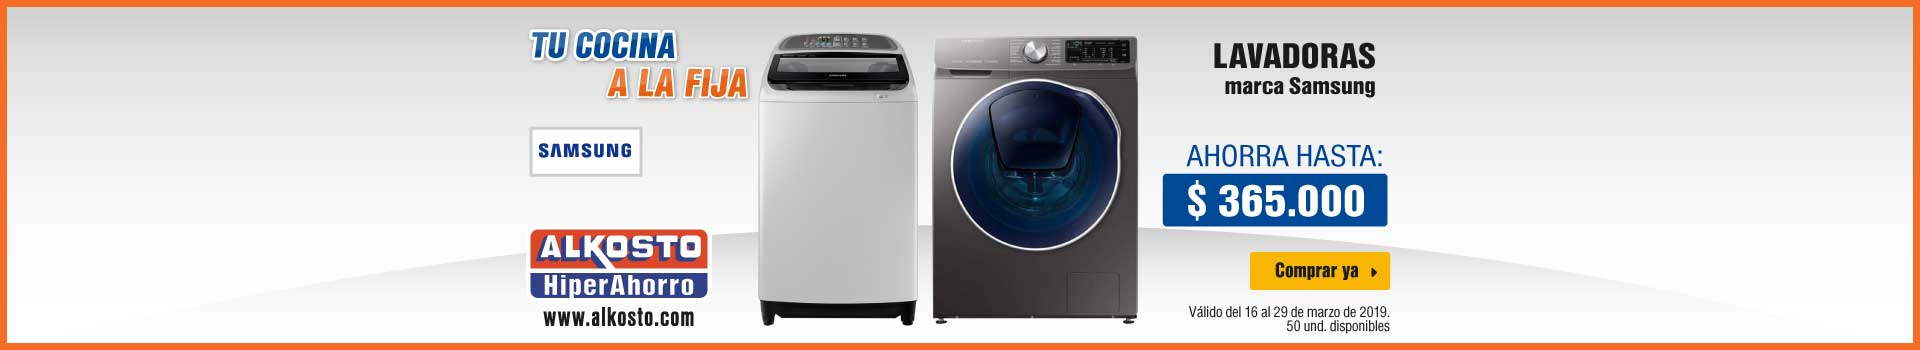 AK-KT-mayores-3-ELECT-BCAT-lavadoras-samsung-160319-2